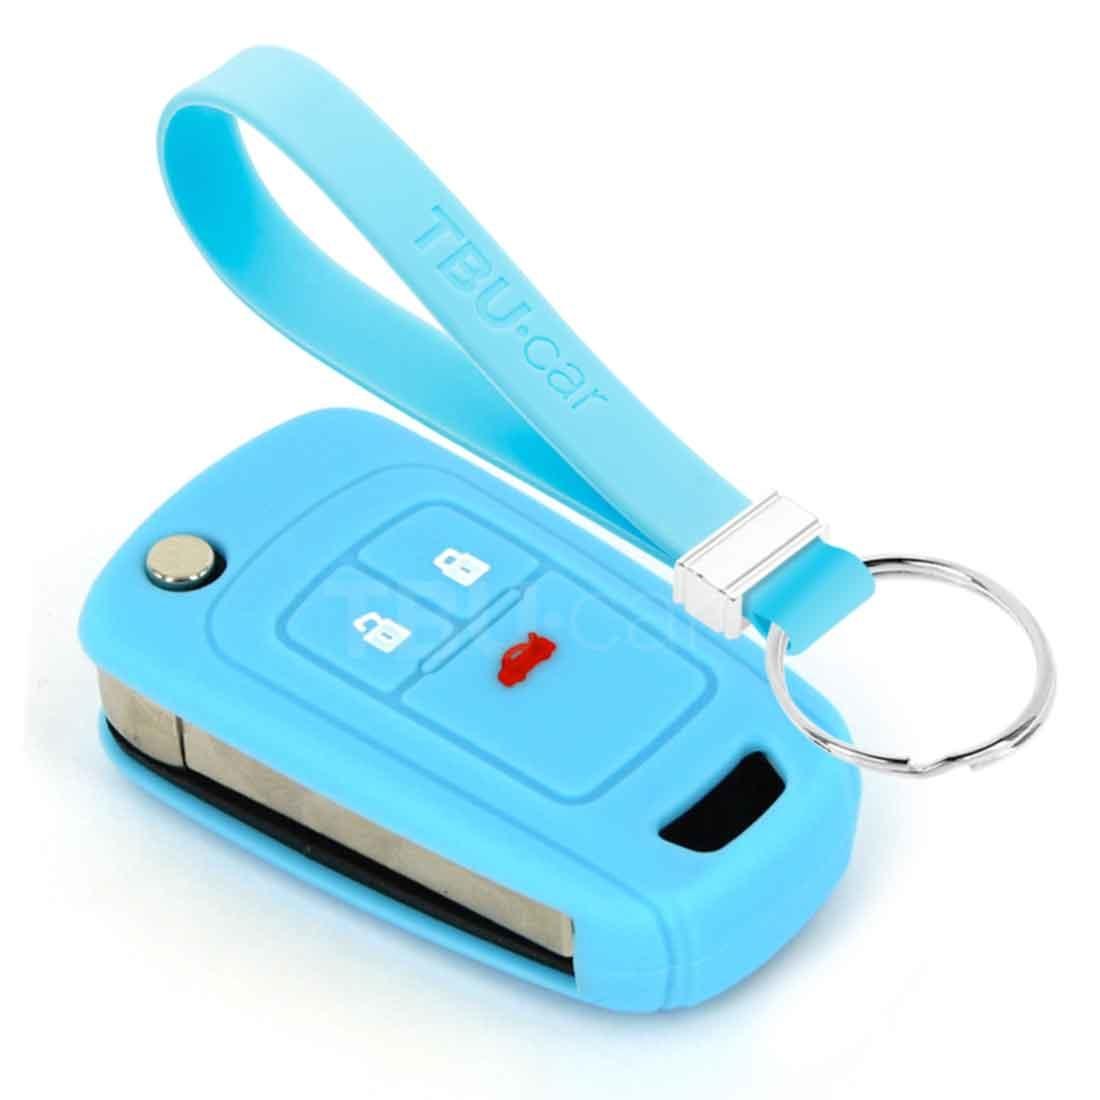 TBU car TBU car Autoschlüssel Hülle kompatibel mit Chevrolet 3 Tasten - Schutzhülle aus Silikon - Auto Schlüsselhülle Cover in Hellblau